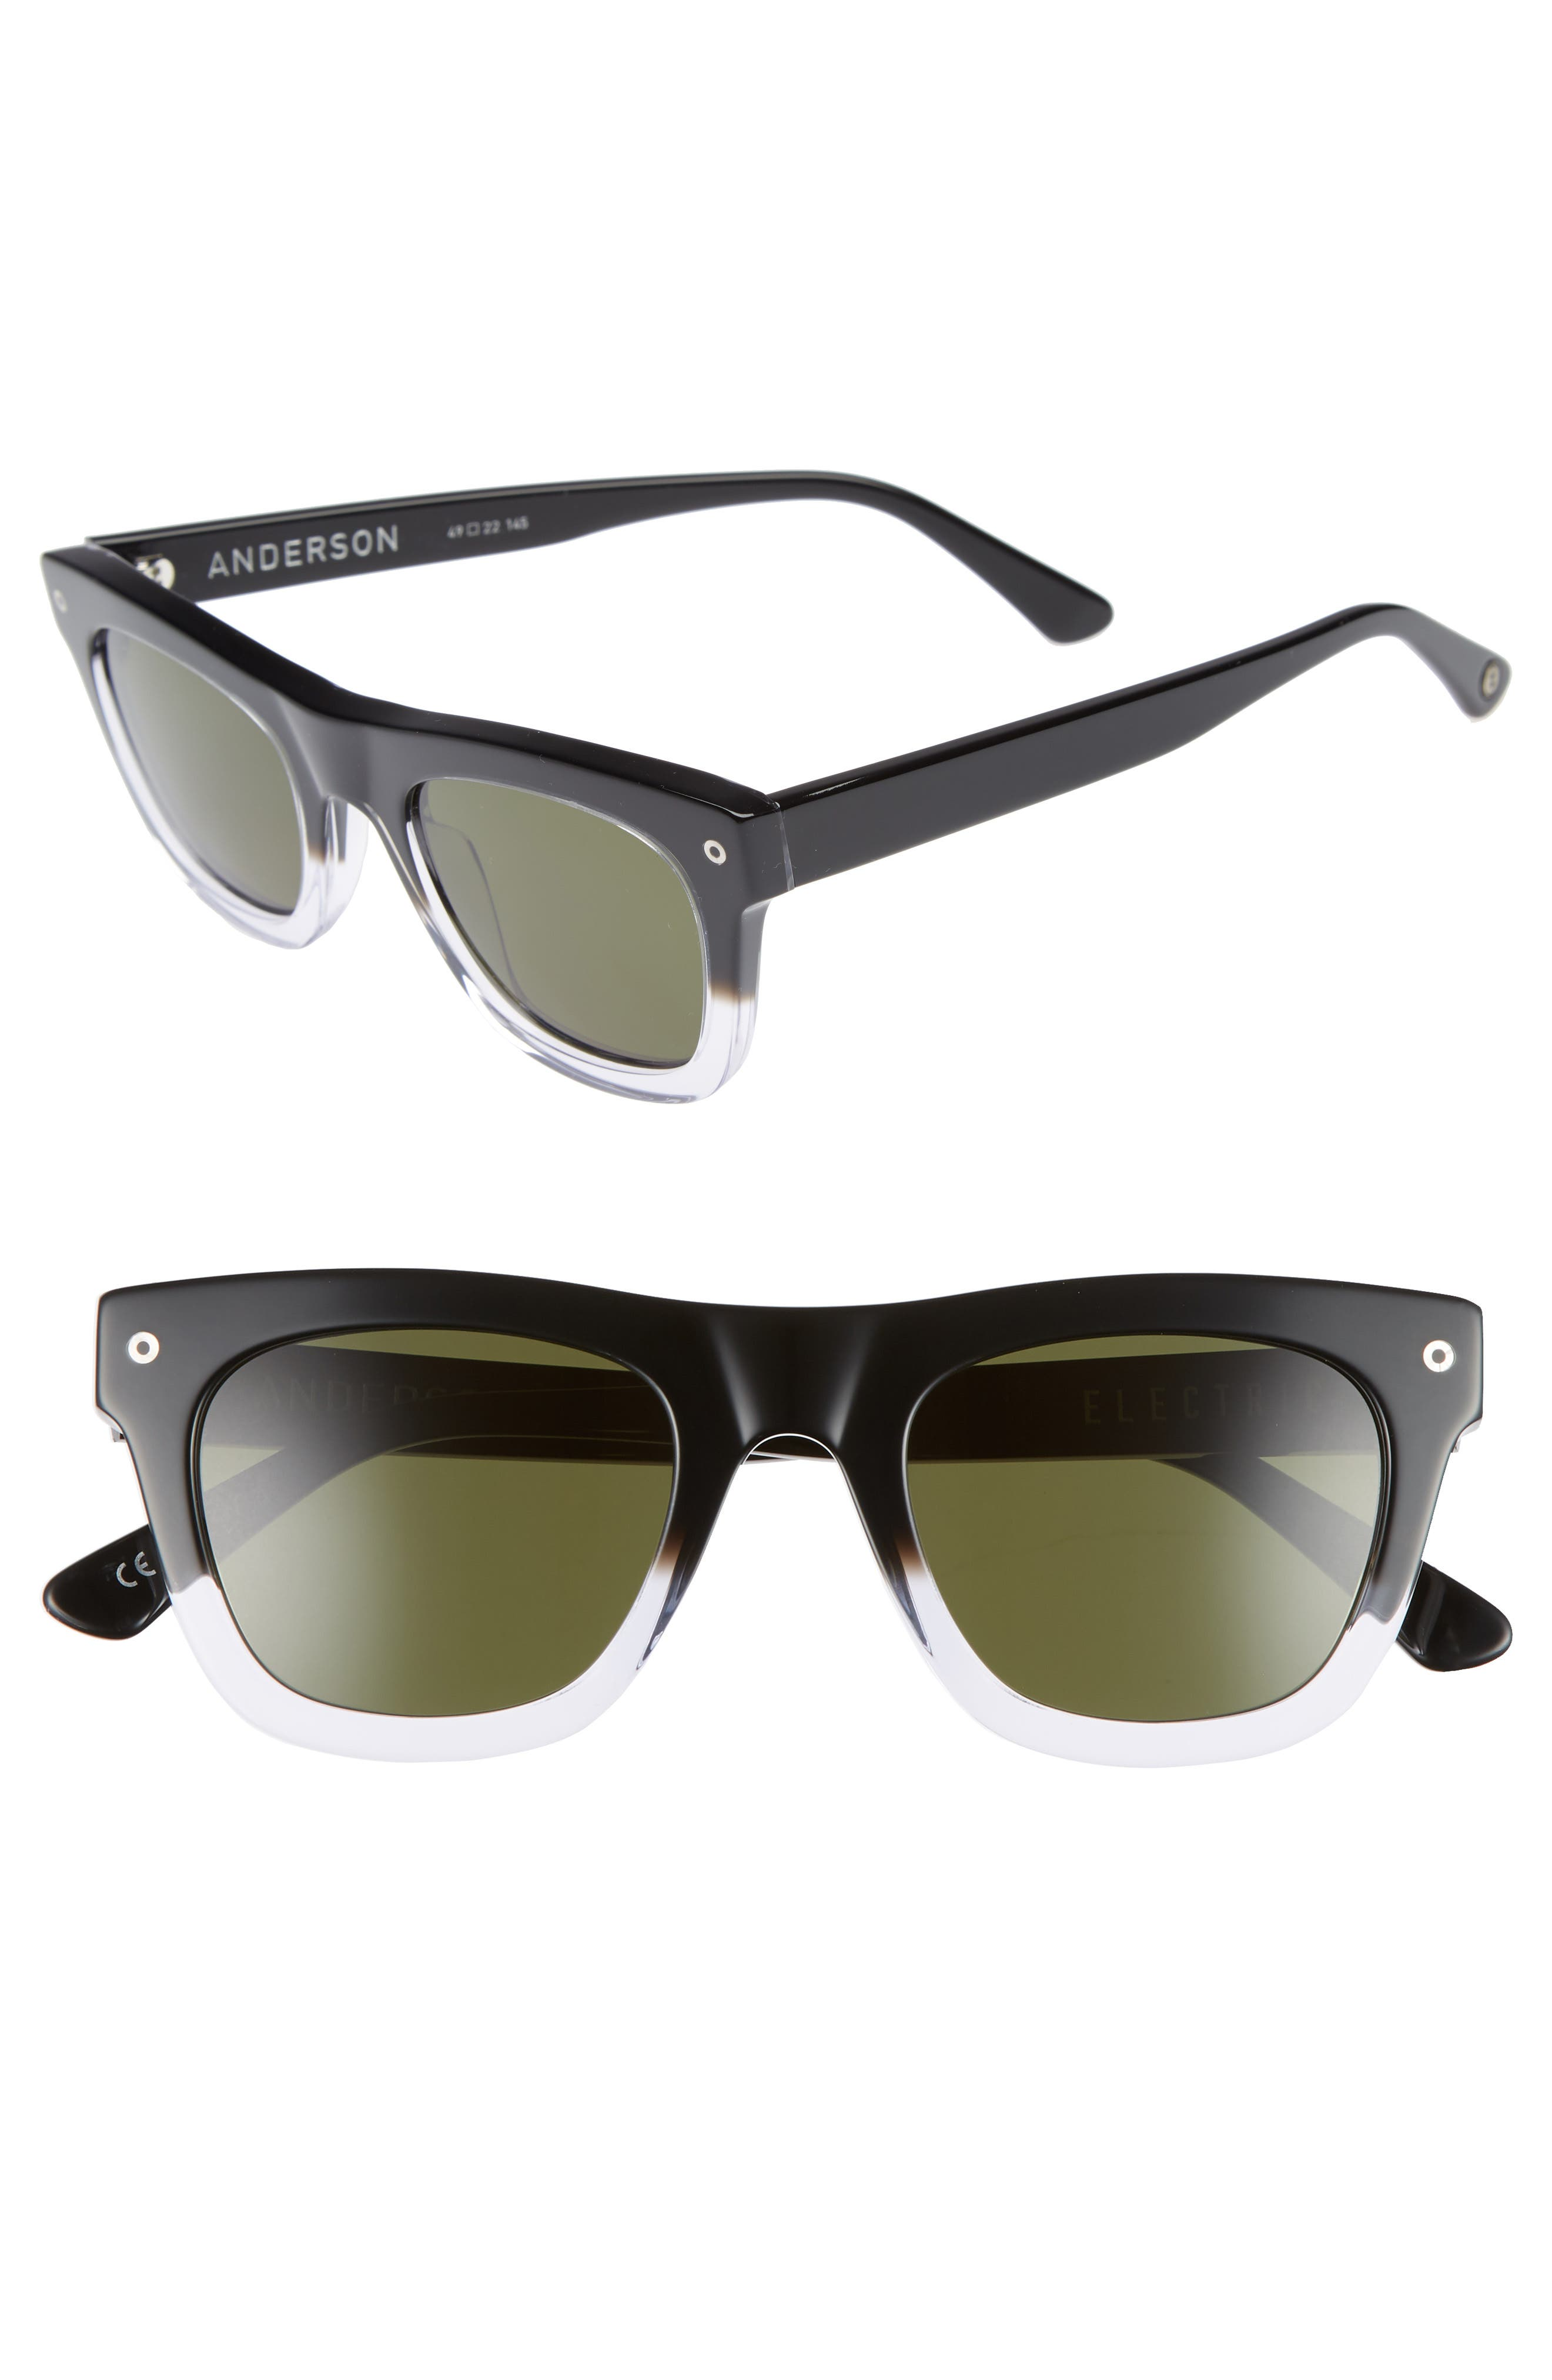 Andersen 49mm Sunglasses,                         Main,                         color, BLACK CLEAR FADE/ GREY